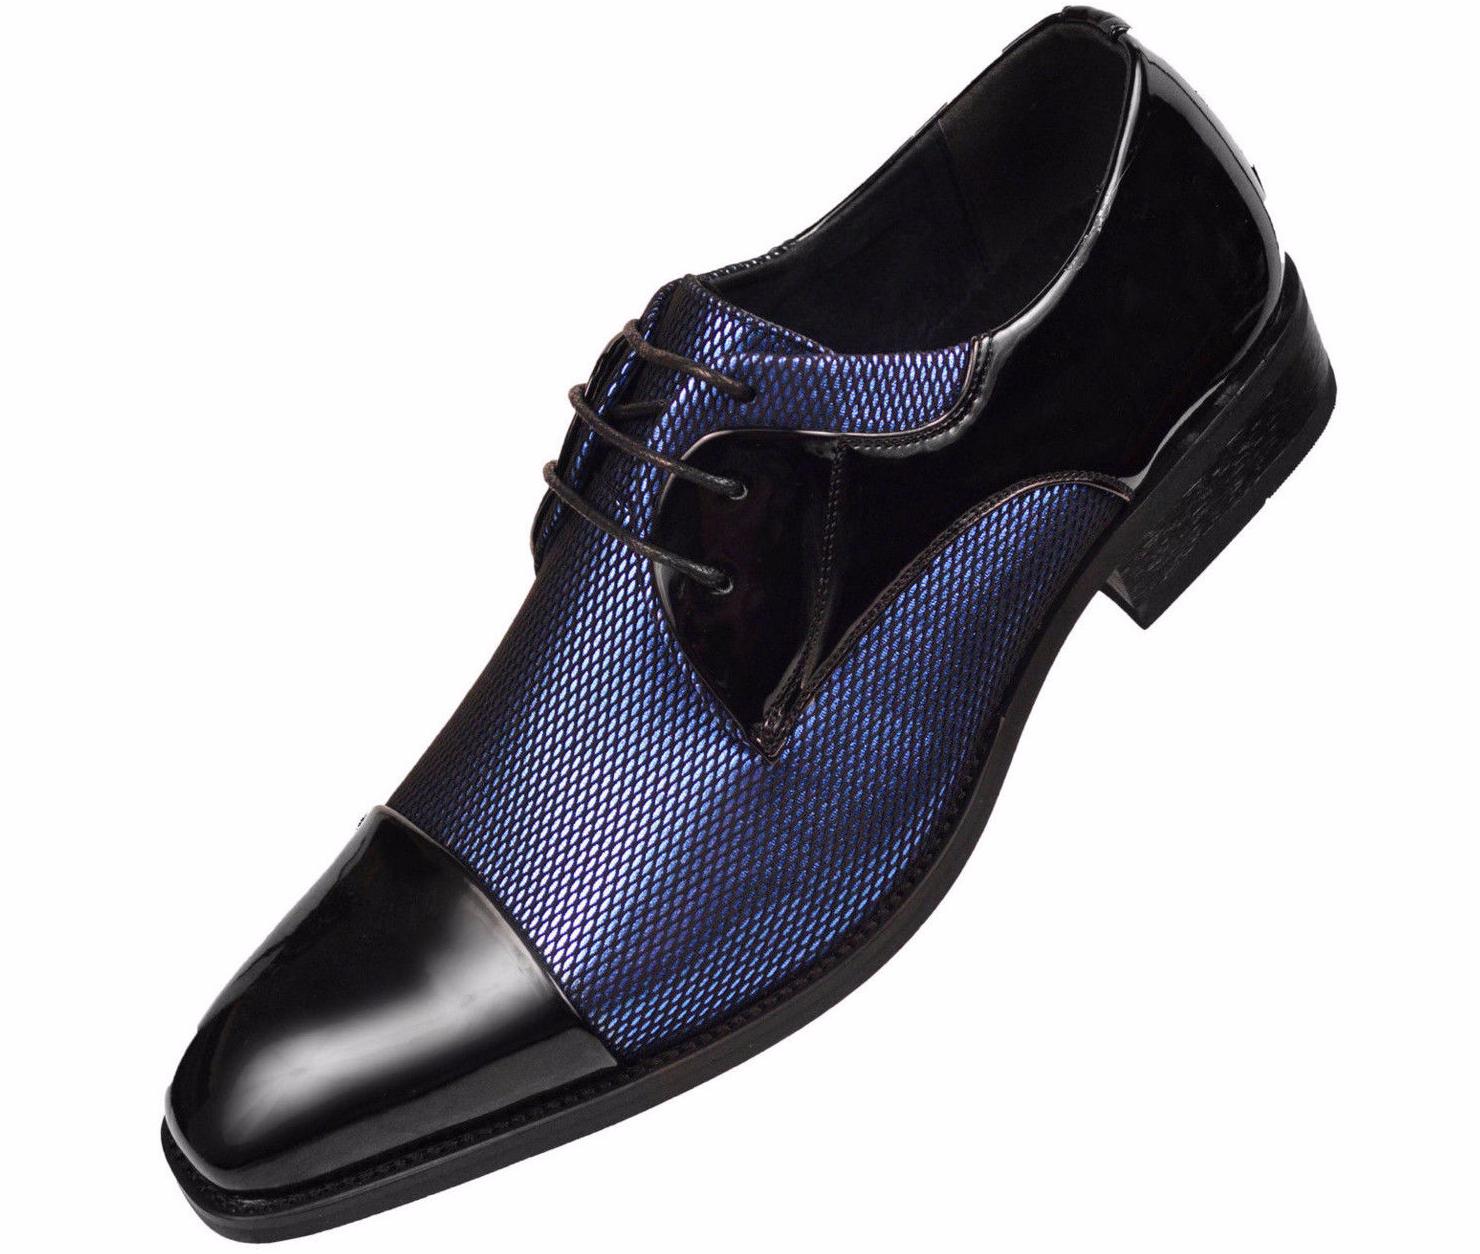 10.5 Amali Royal bluee Fishnet Tuxedo Oxford Dress shoes Patent Cap Draper-052